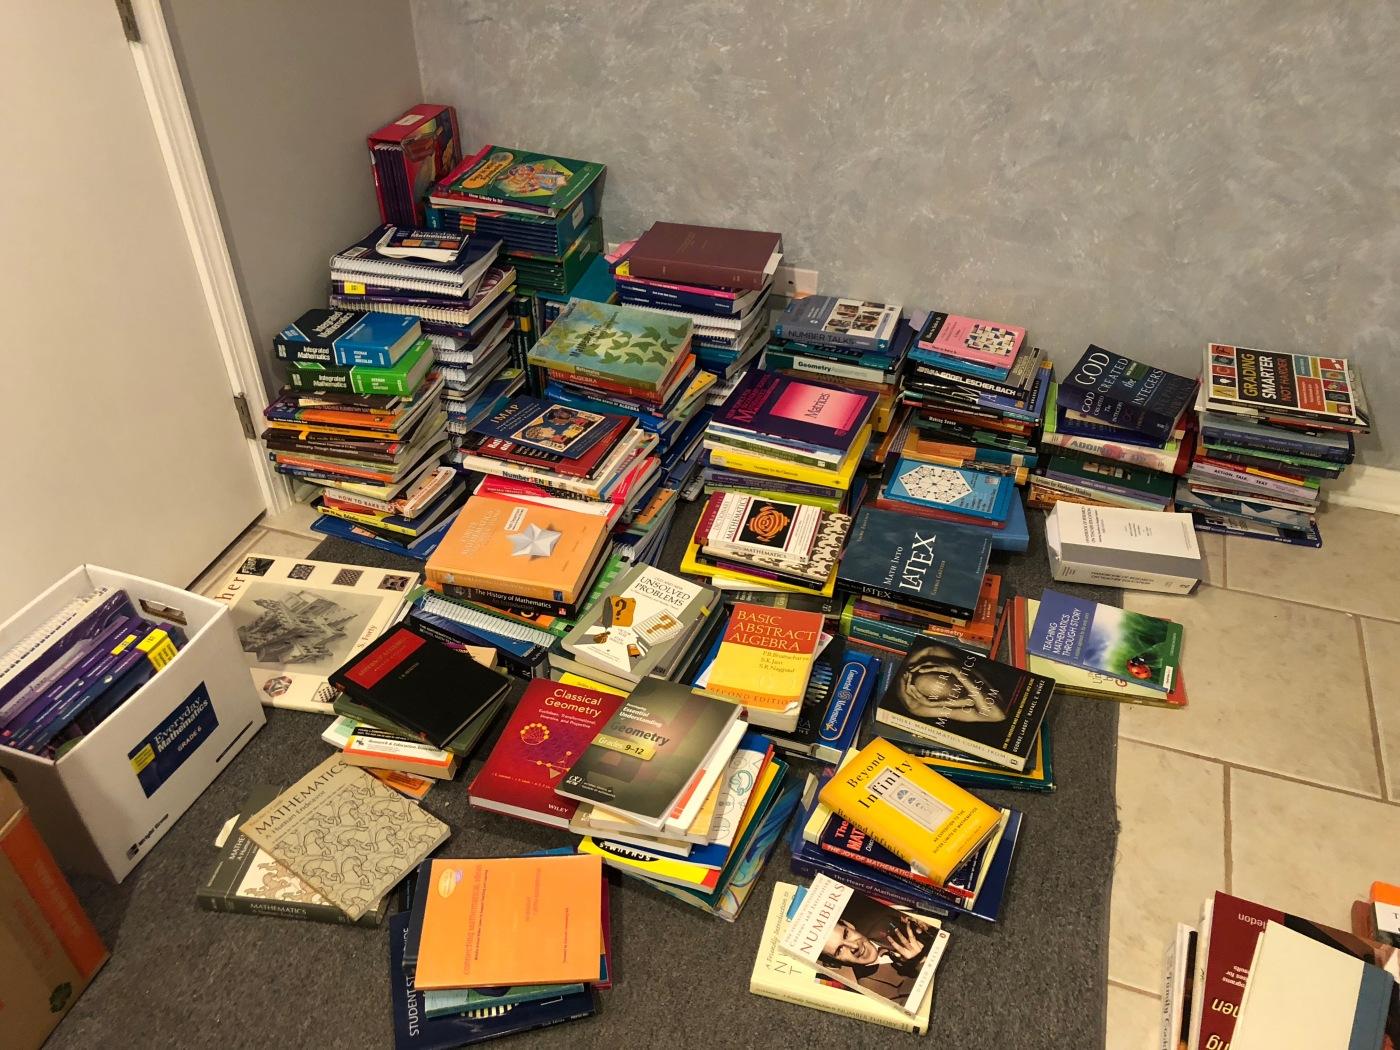 Do your Math Books Spark Joy? – Math Book Magic